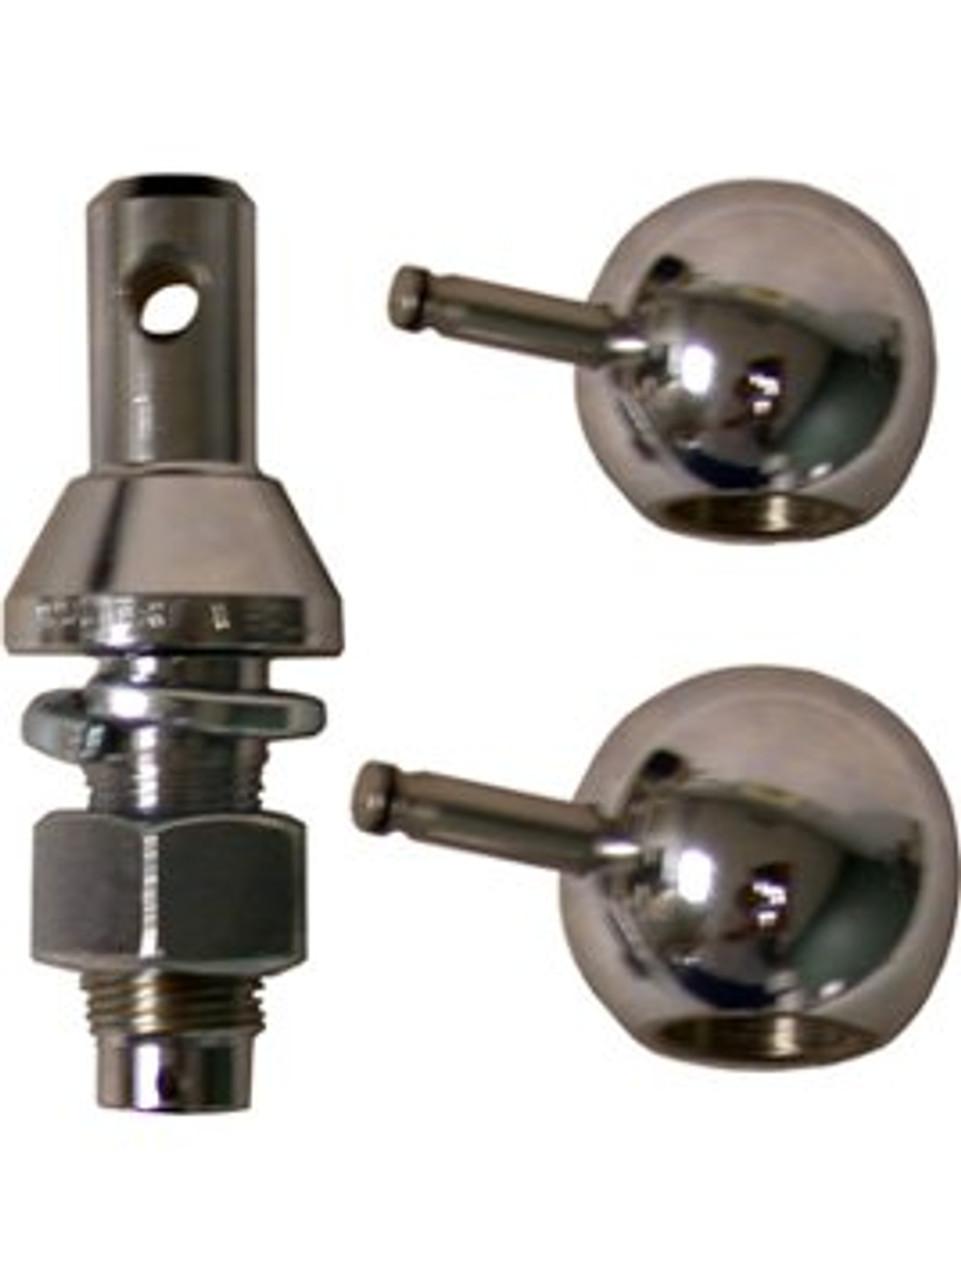 "800B --- Convert-A-Ball Kit, 3/4"" Nickel Regular Shank plus 1-7/8"" and 2"" Nickel Hitch Balls"